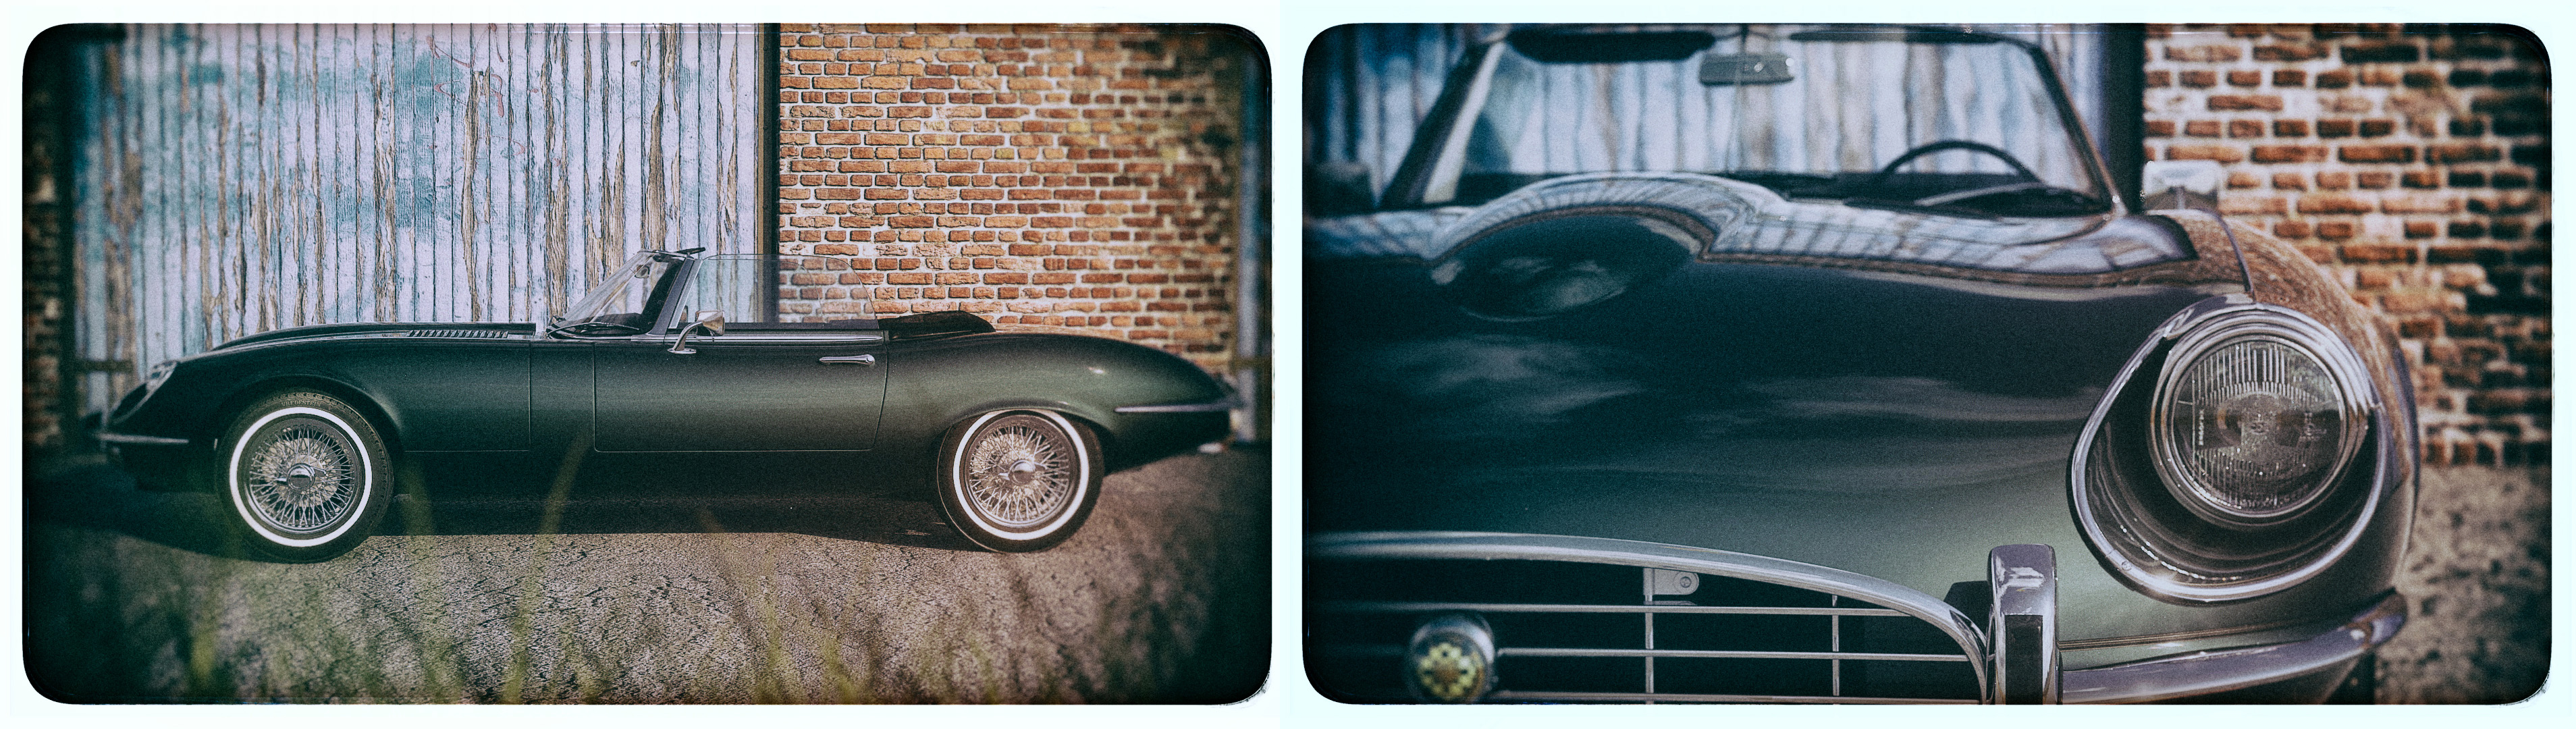 1970 Jaguar E-type 3d art